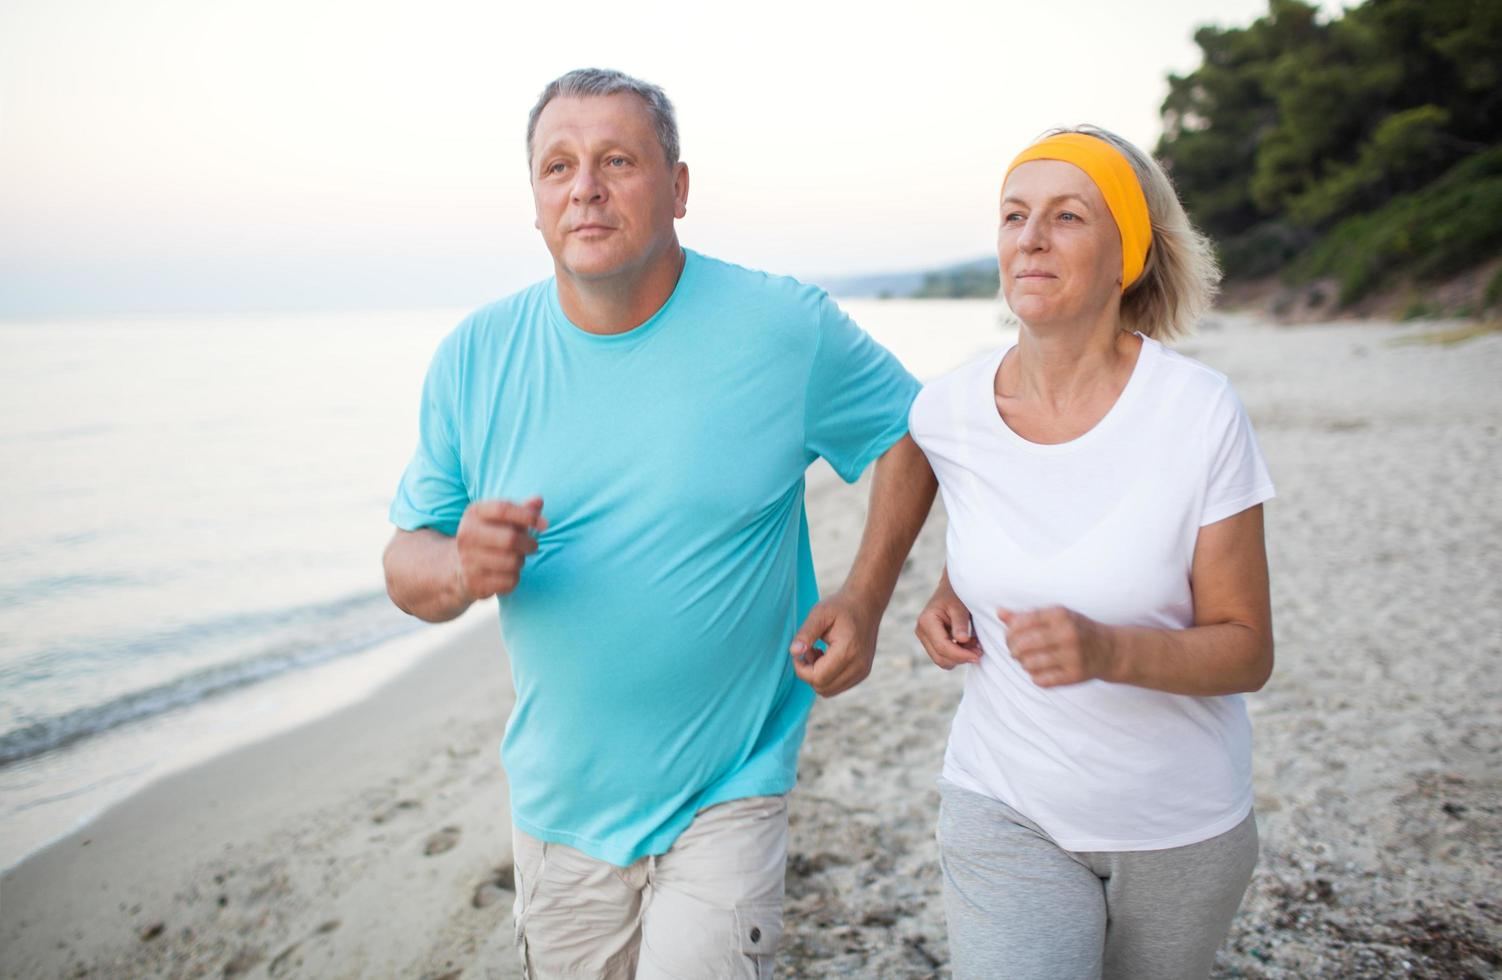 Senior couple jogging on the beach photo